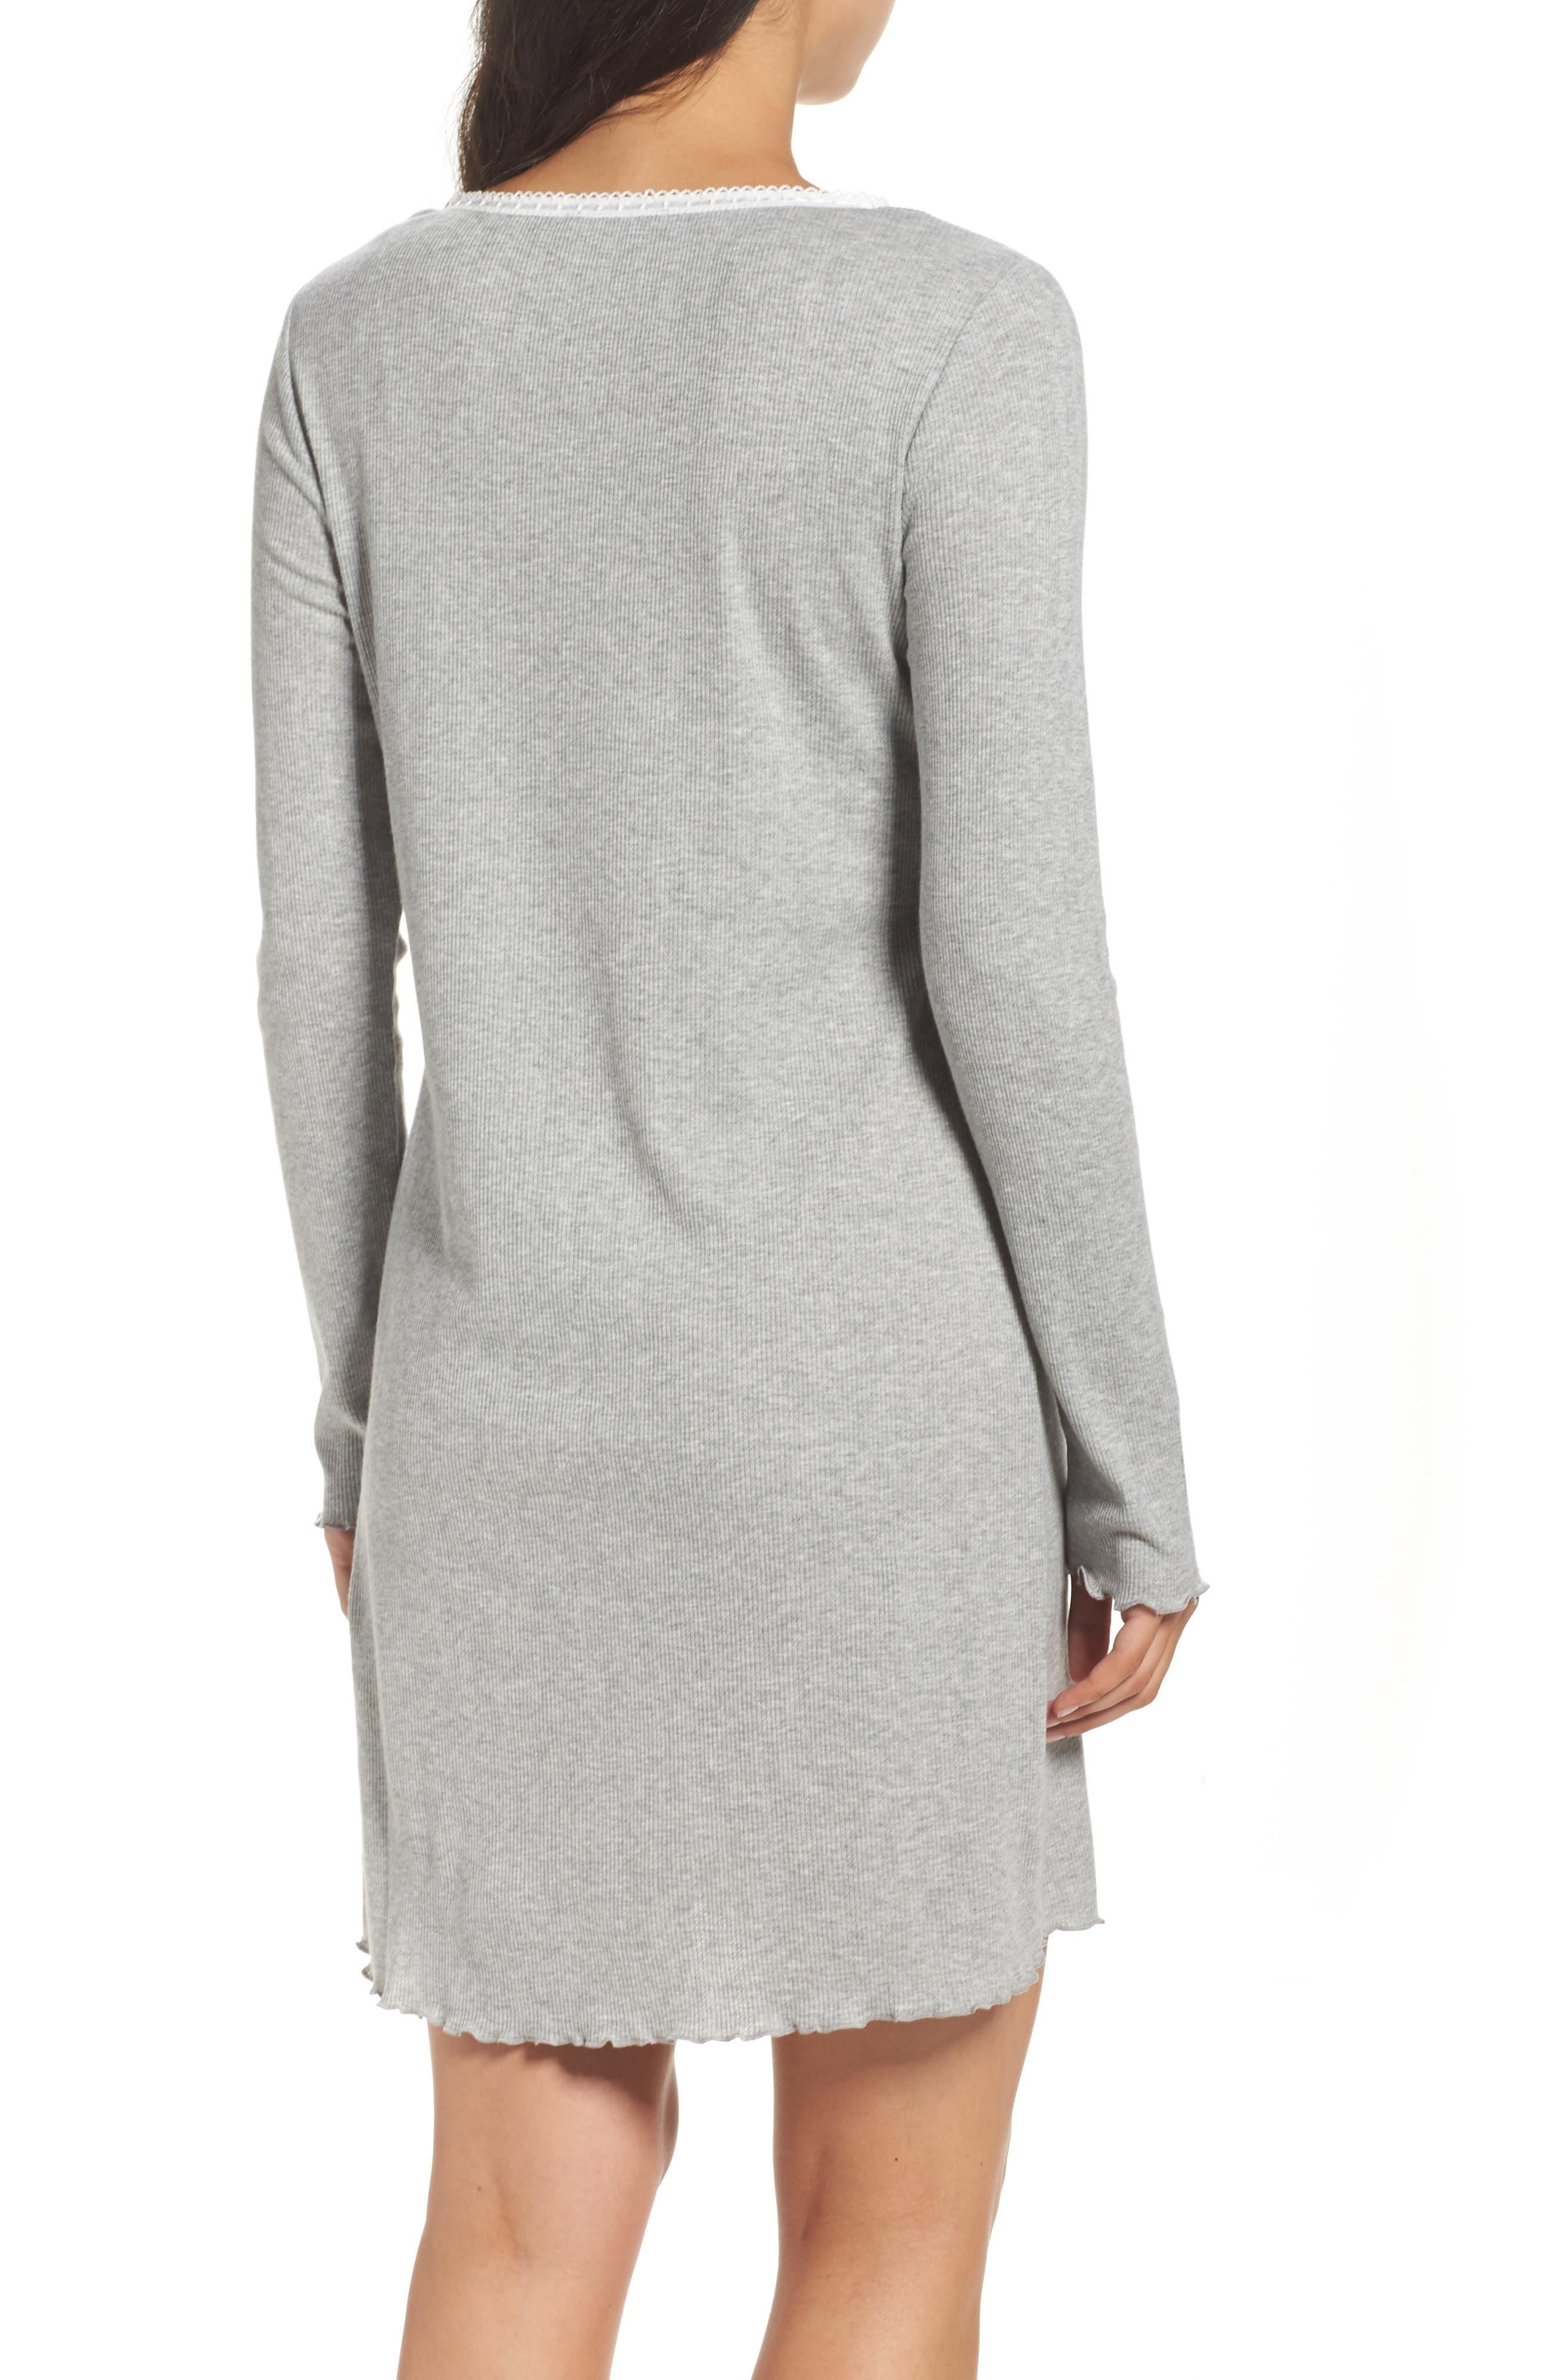 Lace Neck Sleep Shirt,                             Alternate thumbnail 2, color,                             022